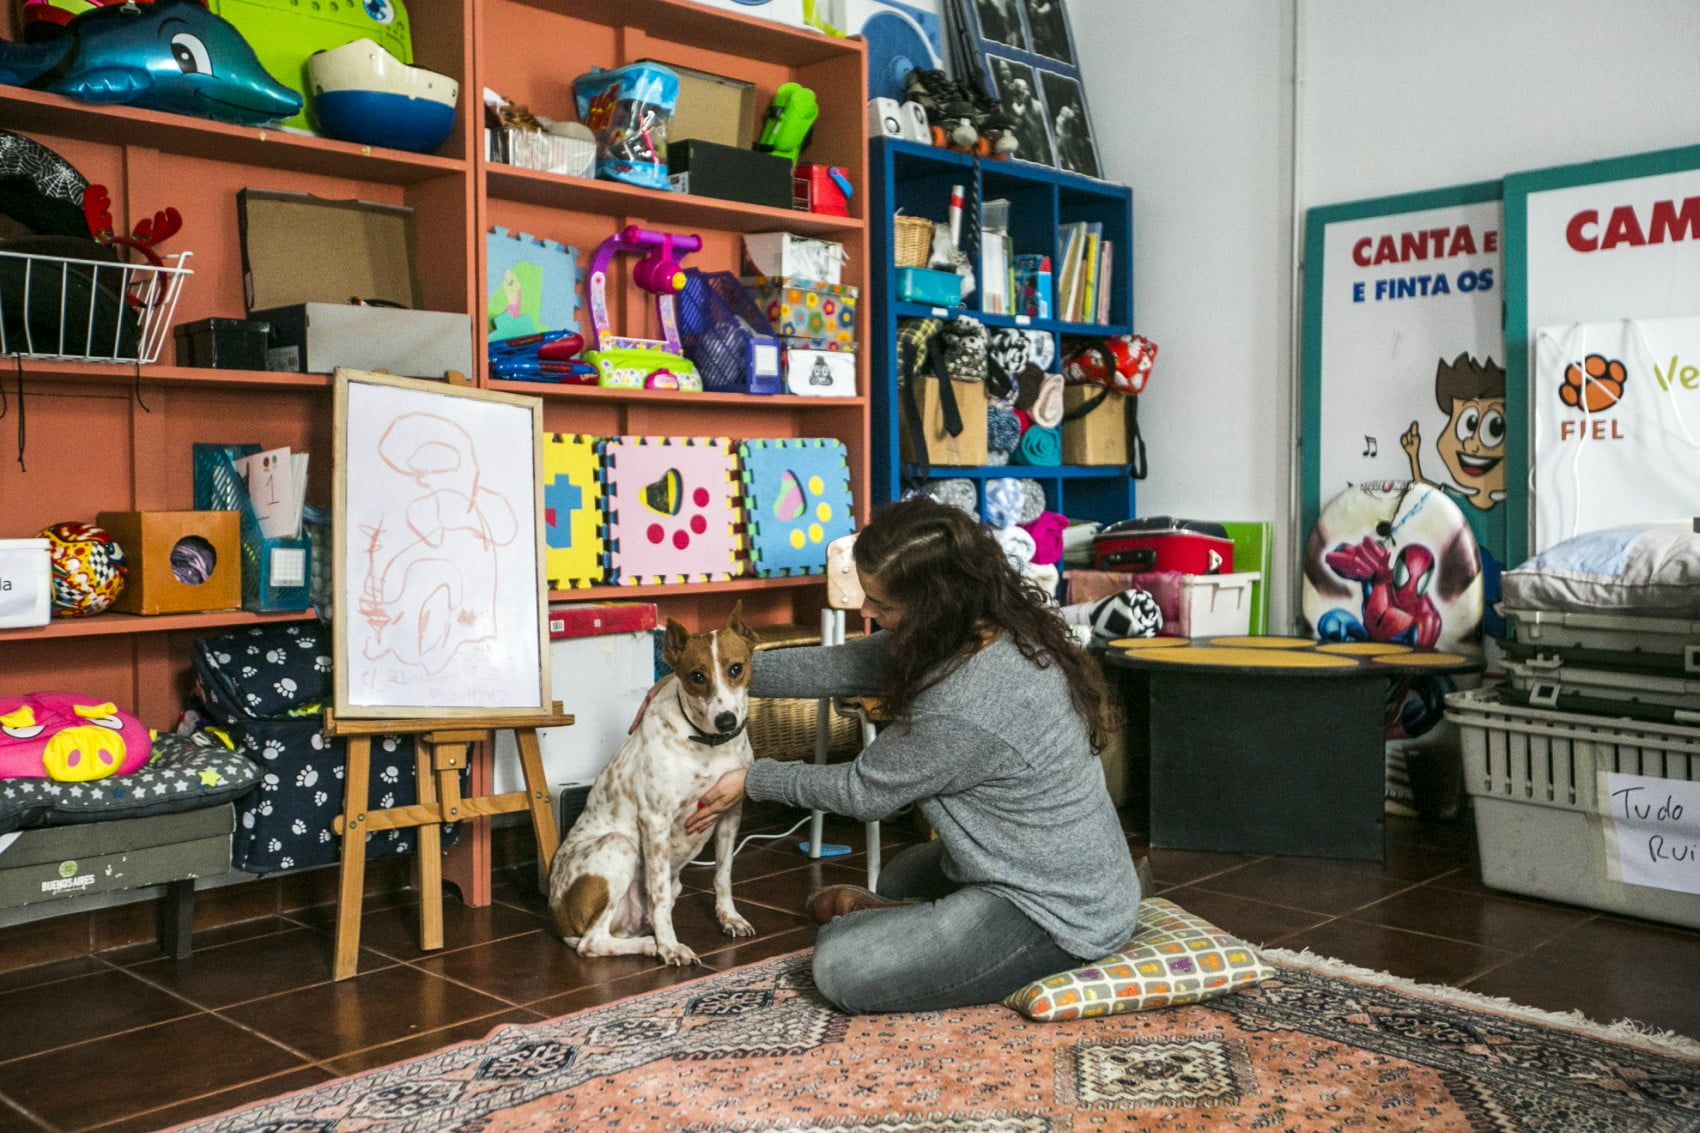 MargaridaCamara7-veterinariaatual